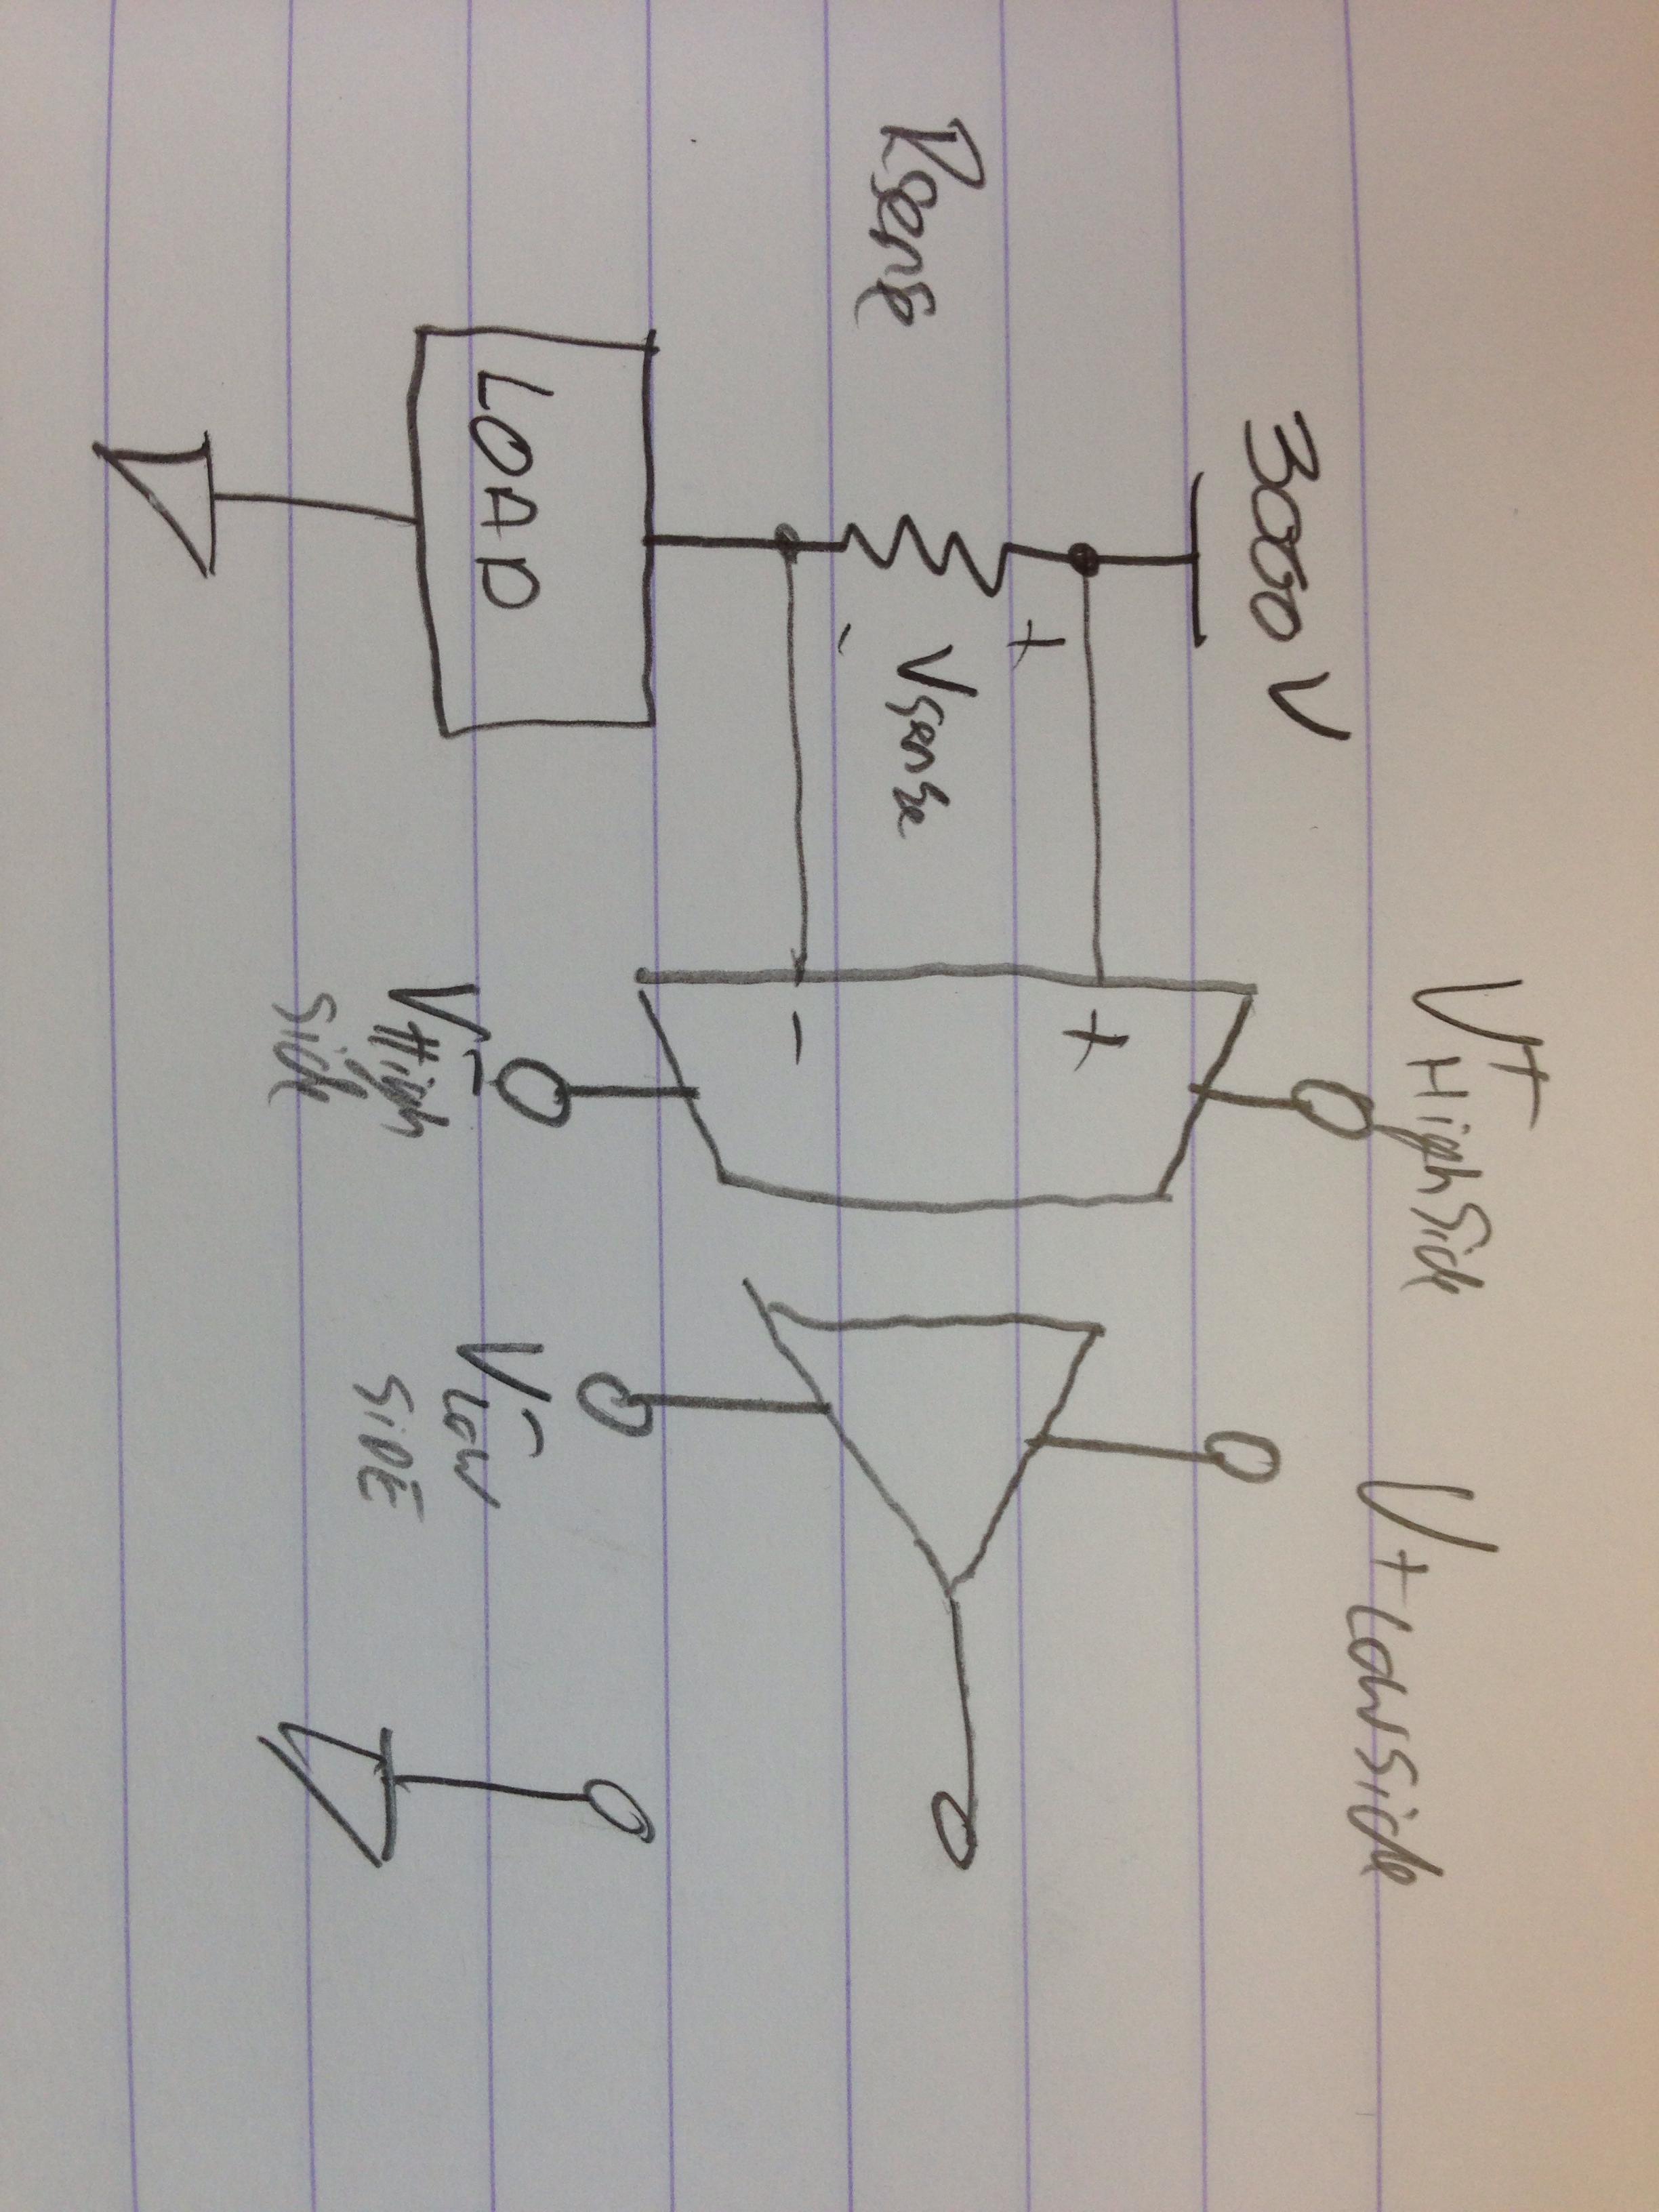 resistor circuit diagram kicker l5 12 wiring amplifier - powering an amc1200 isolation amp electrical engineering stack exchange